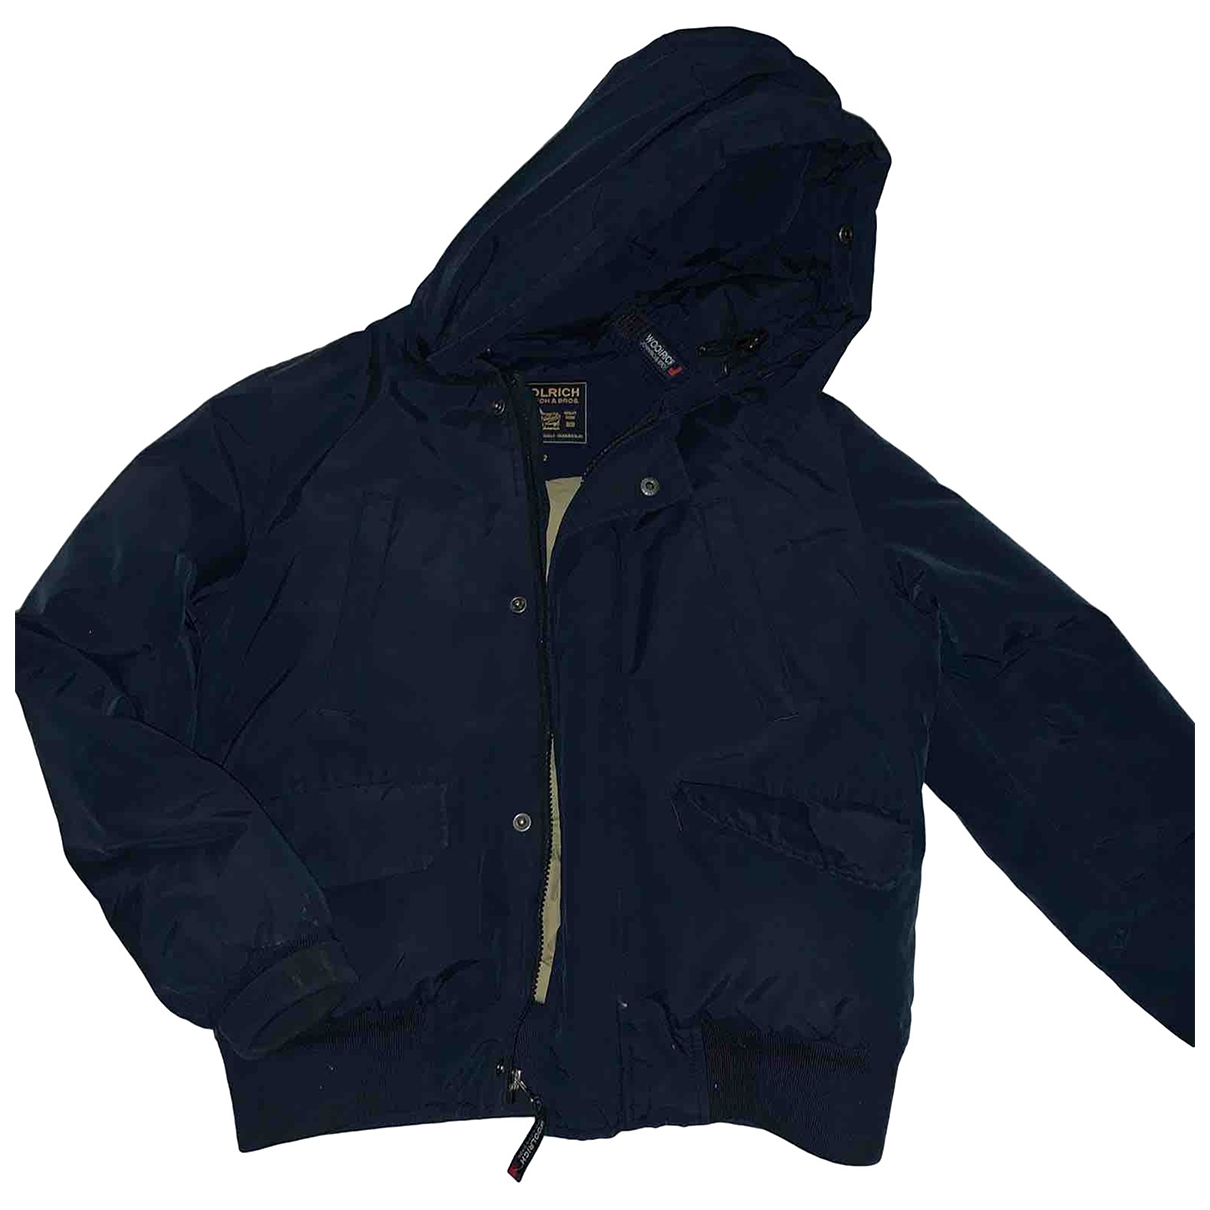 Woolrich \N Blue jacket & coat for Kids 12 years - XS UK